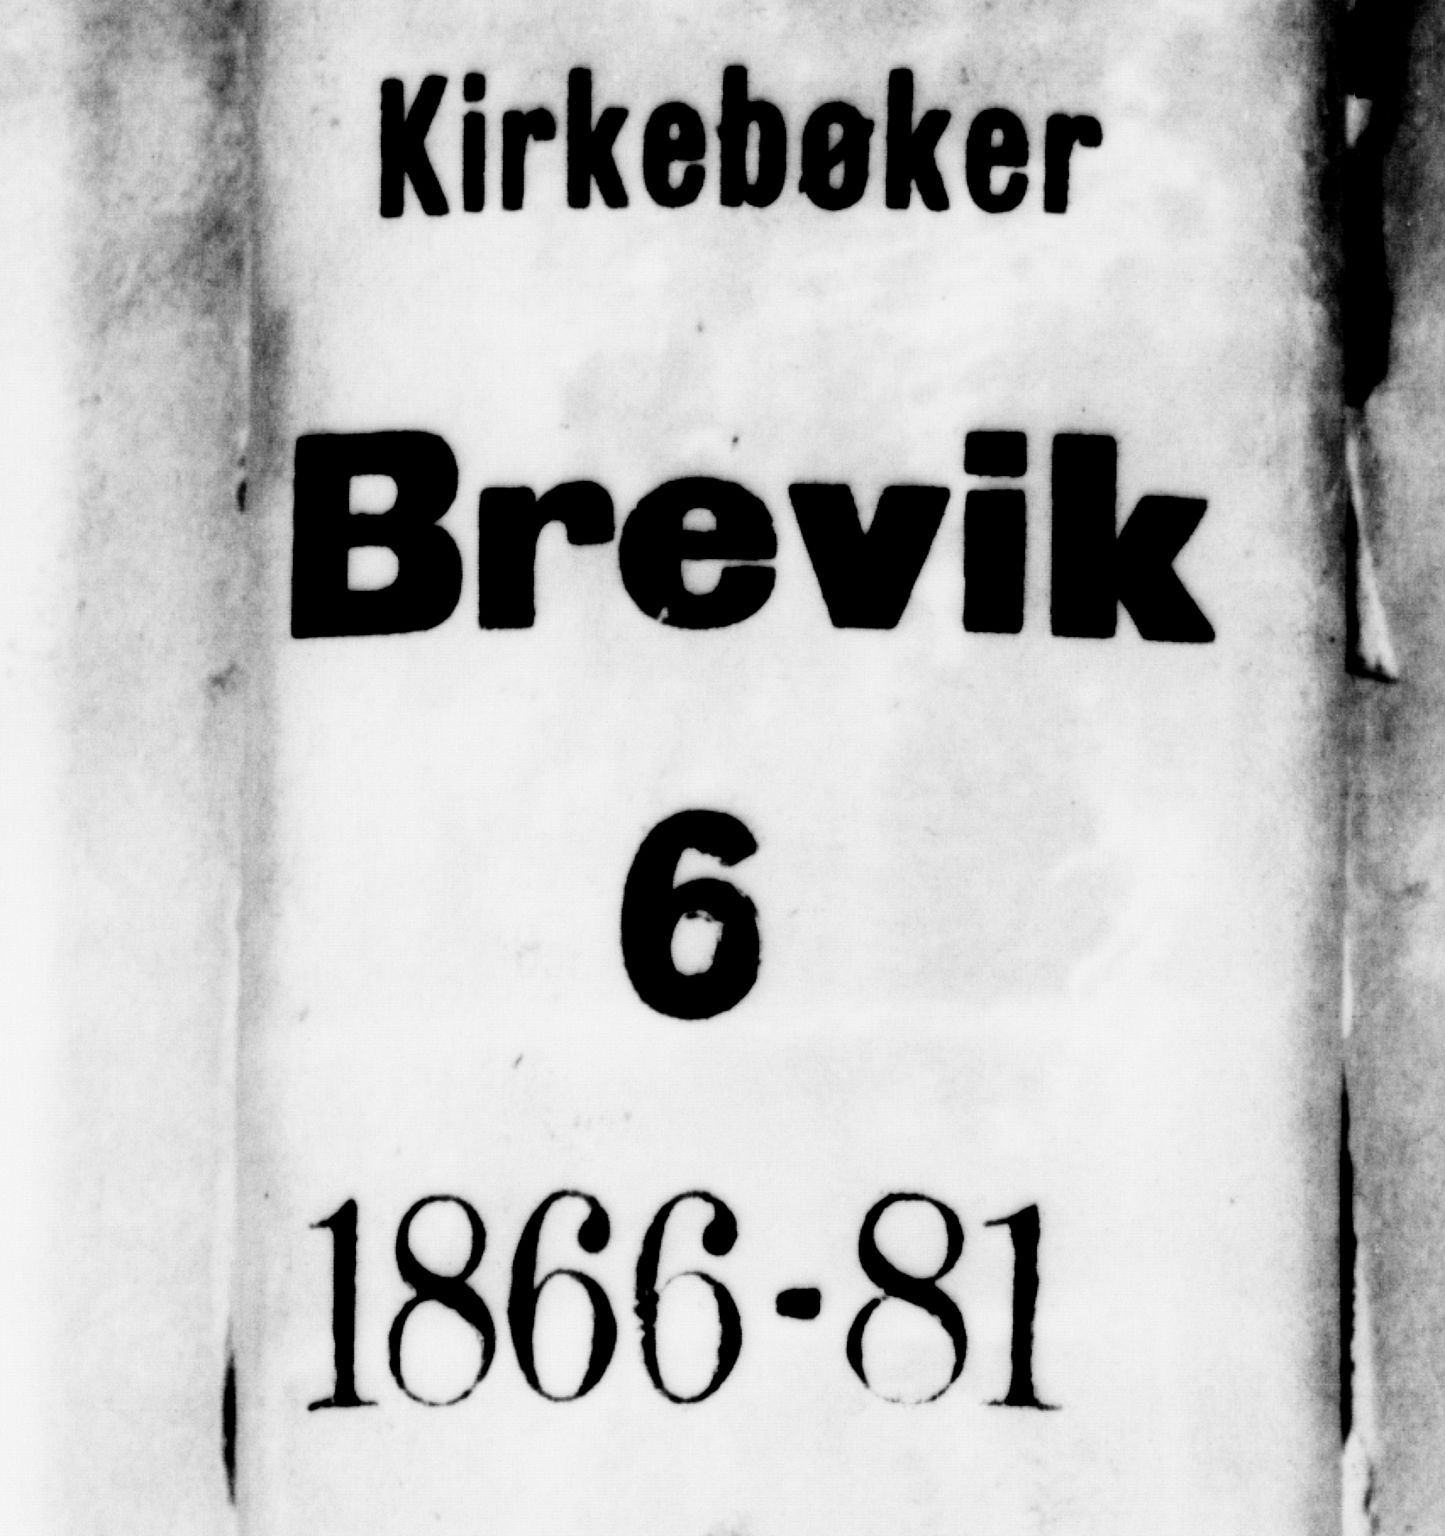 SAKO, Brevik kirkebøker, G/Ga/L0003: Klokkerbok nr. 3, 1866-1881